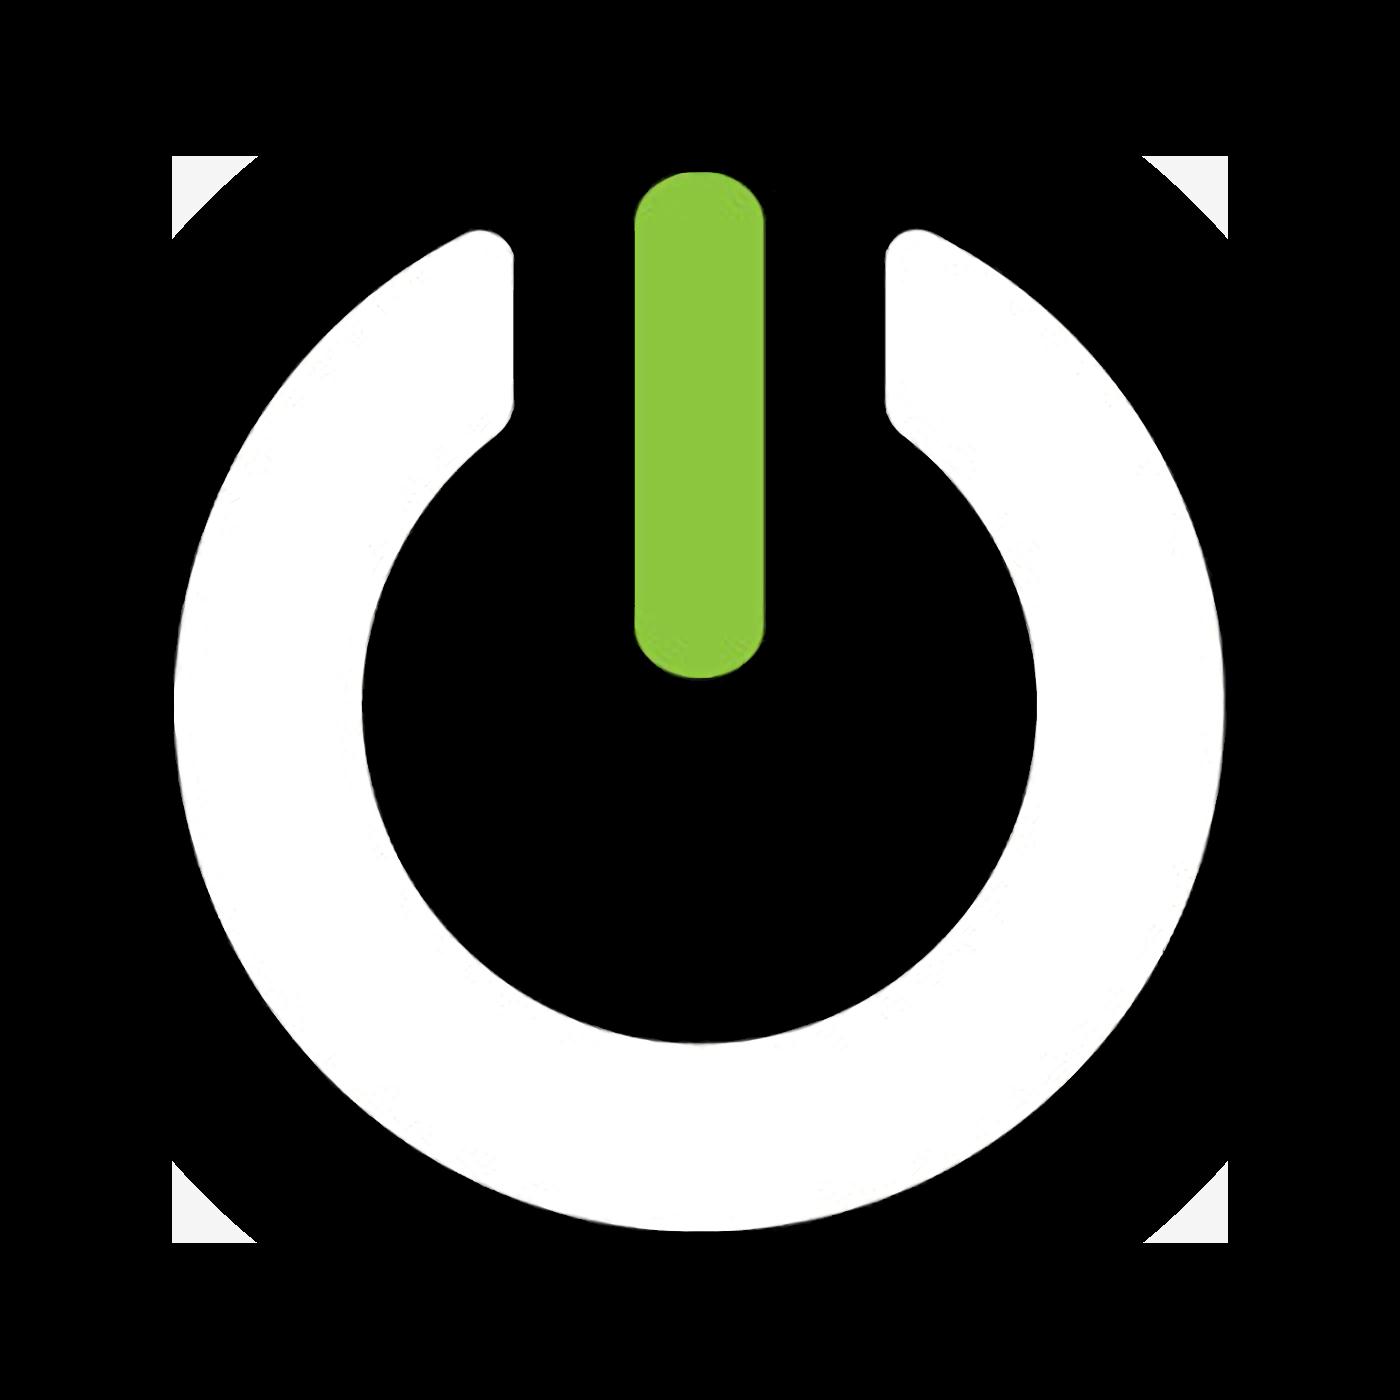 Avatar - UploadVR